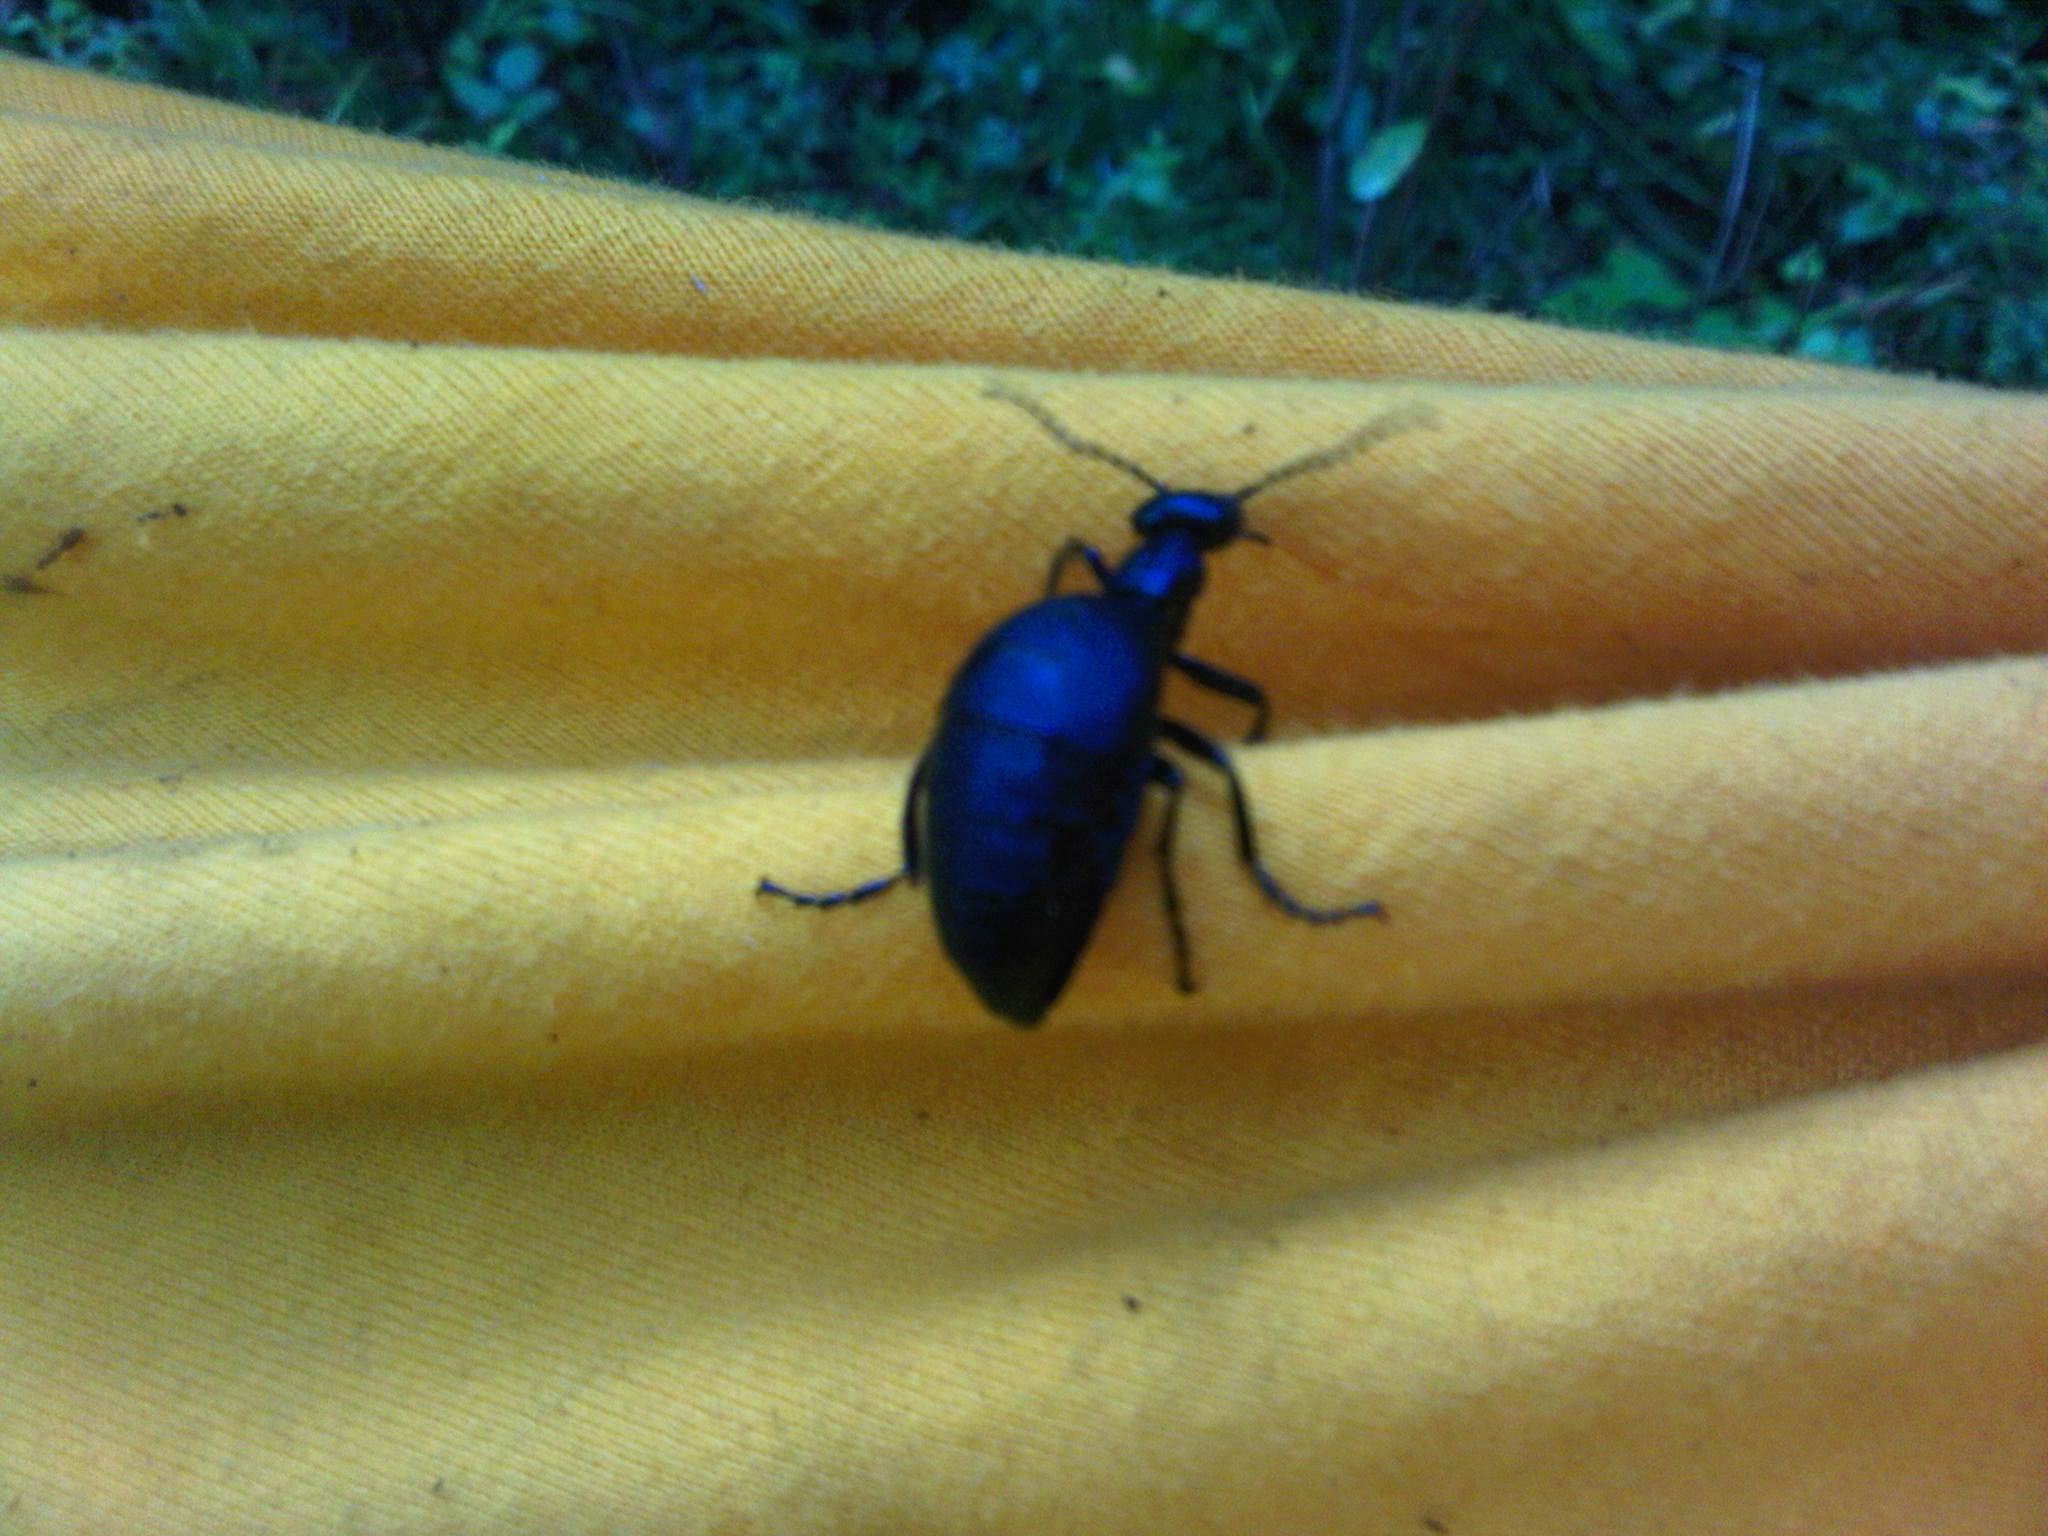 Short-wiinged blister beetle